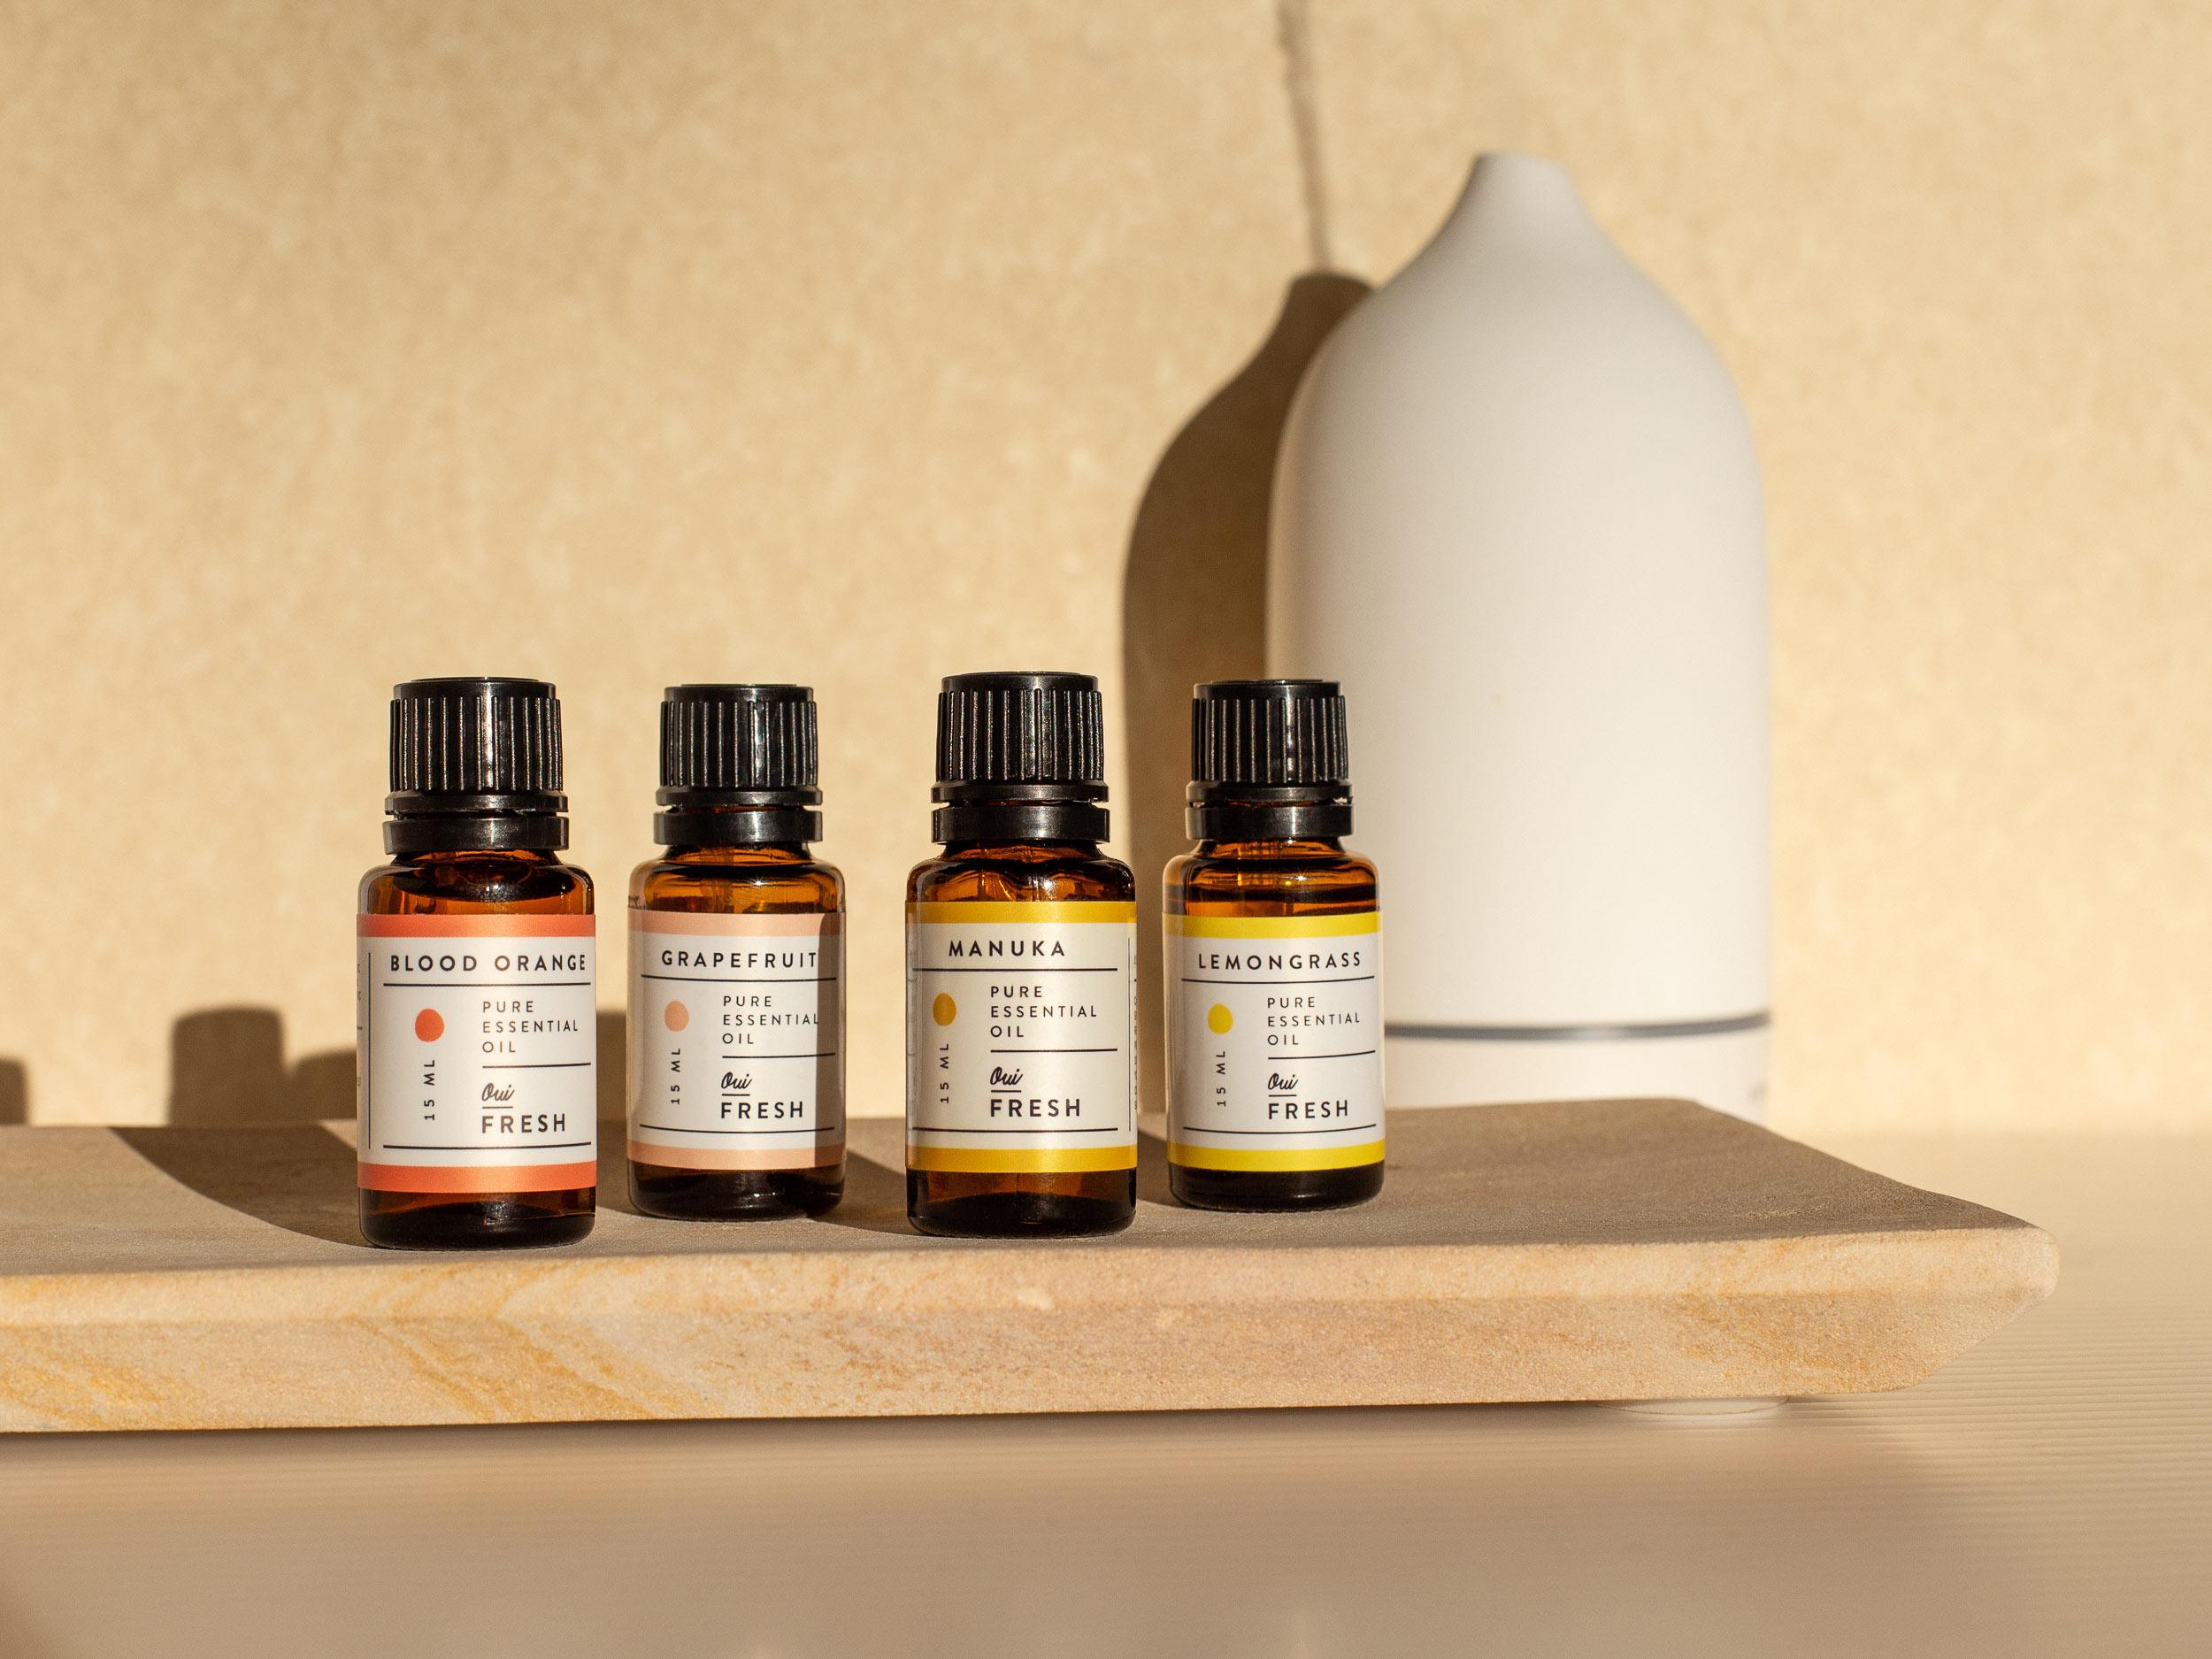 oui-fresh-essential-oil-packaging-design-group-warm.jpg